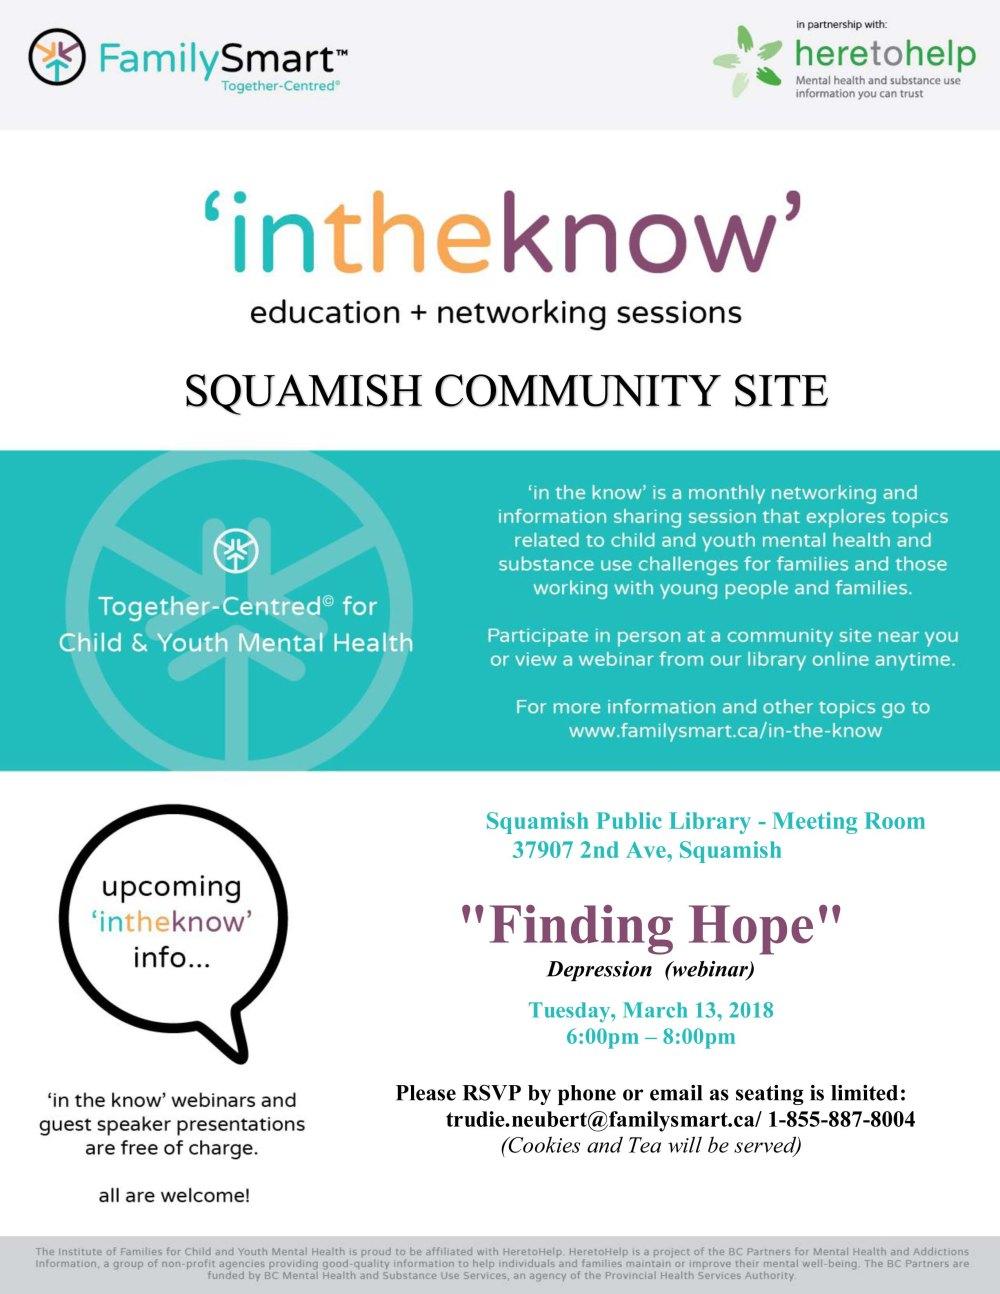 FamilySmart-ITK-Poster-Squamish-Mar-13-2018[2]